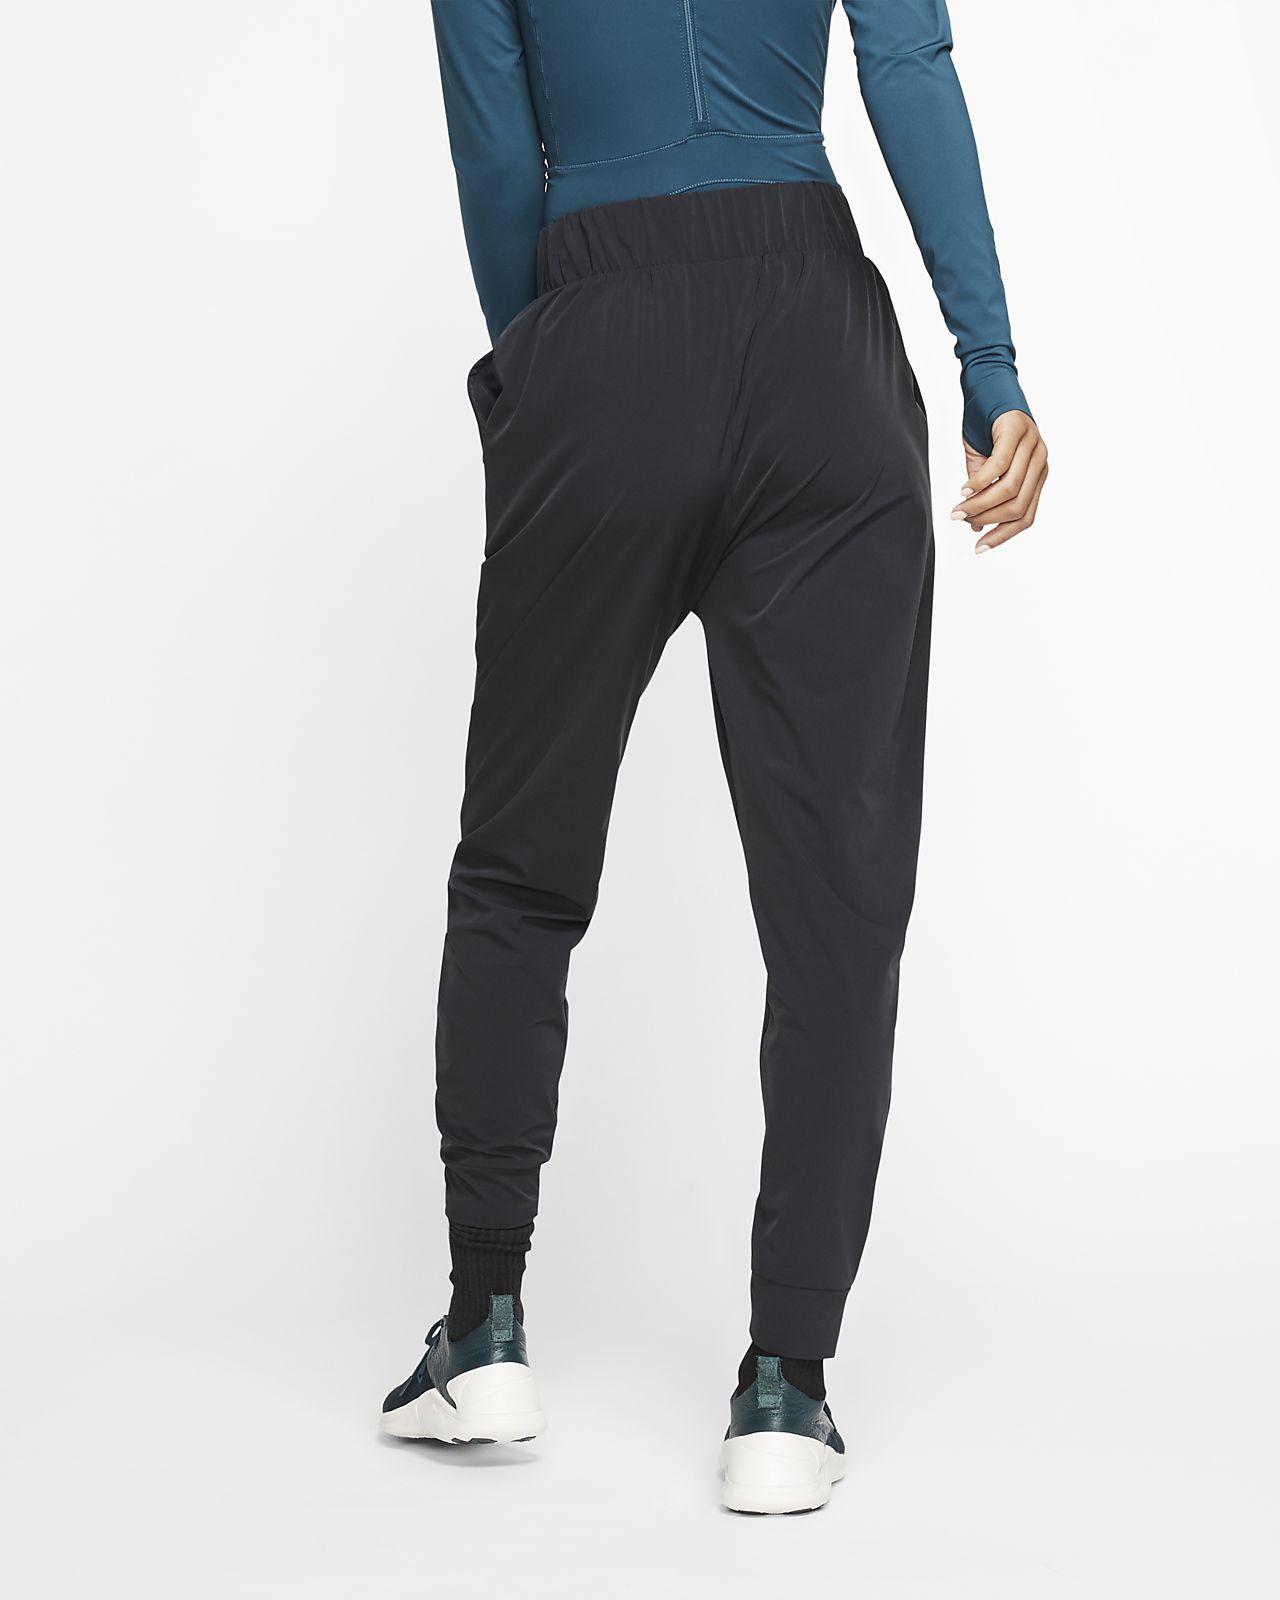 298b4e1f Low Resolution Женские брюки Nike Bliss Женские брюки Nike Bliss